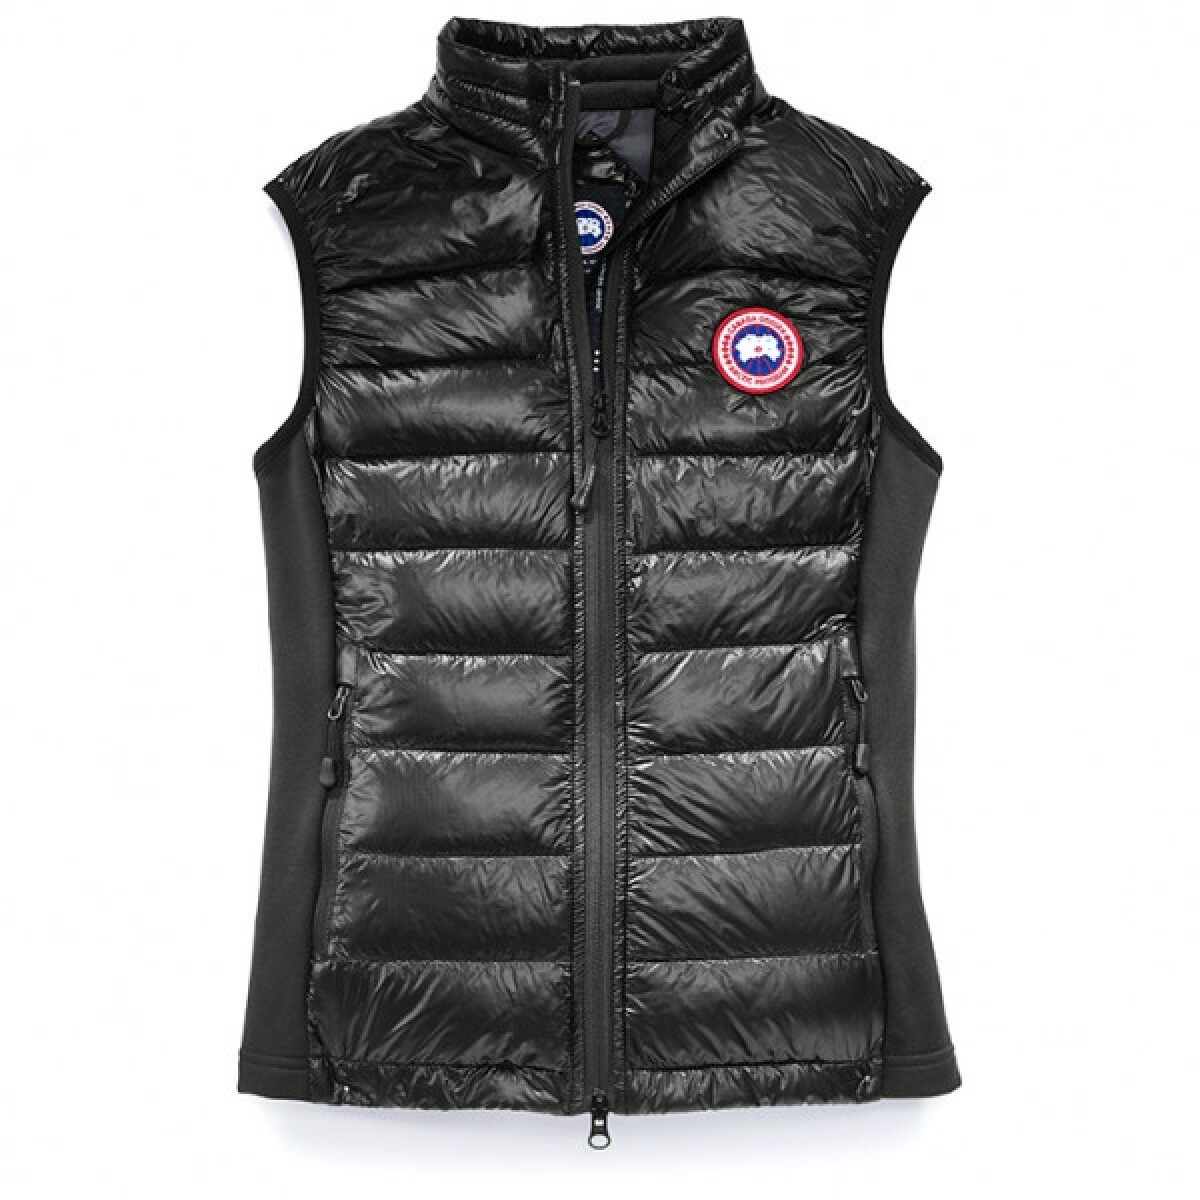 Canada Goose | Dames Bodywarmer| 2237 zwart